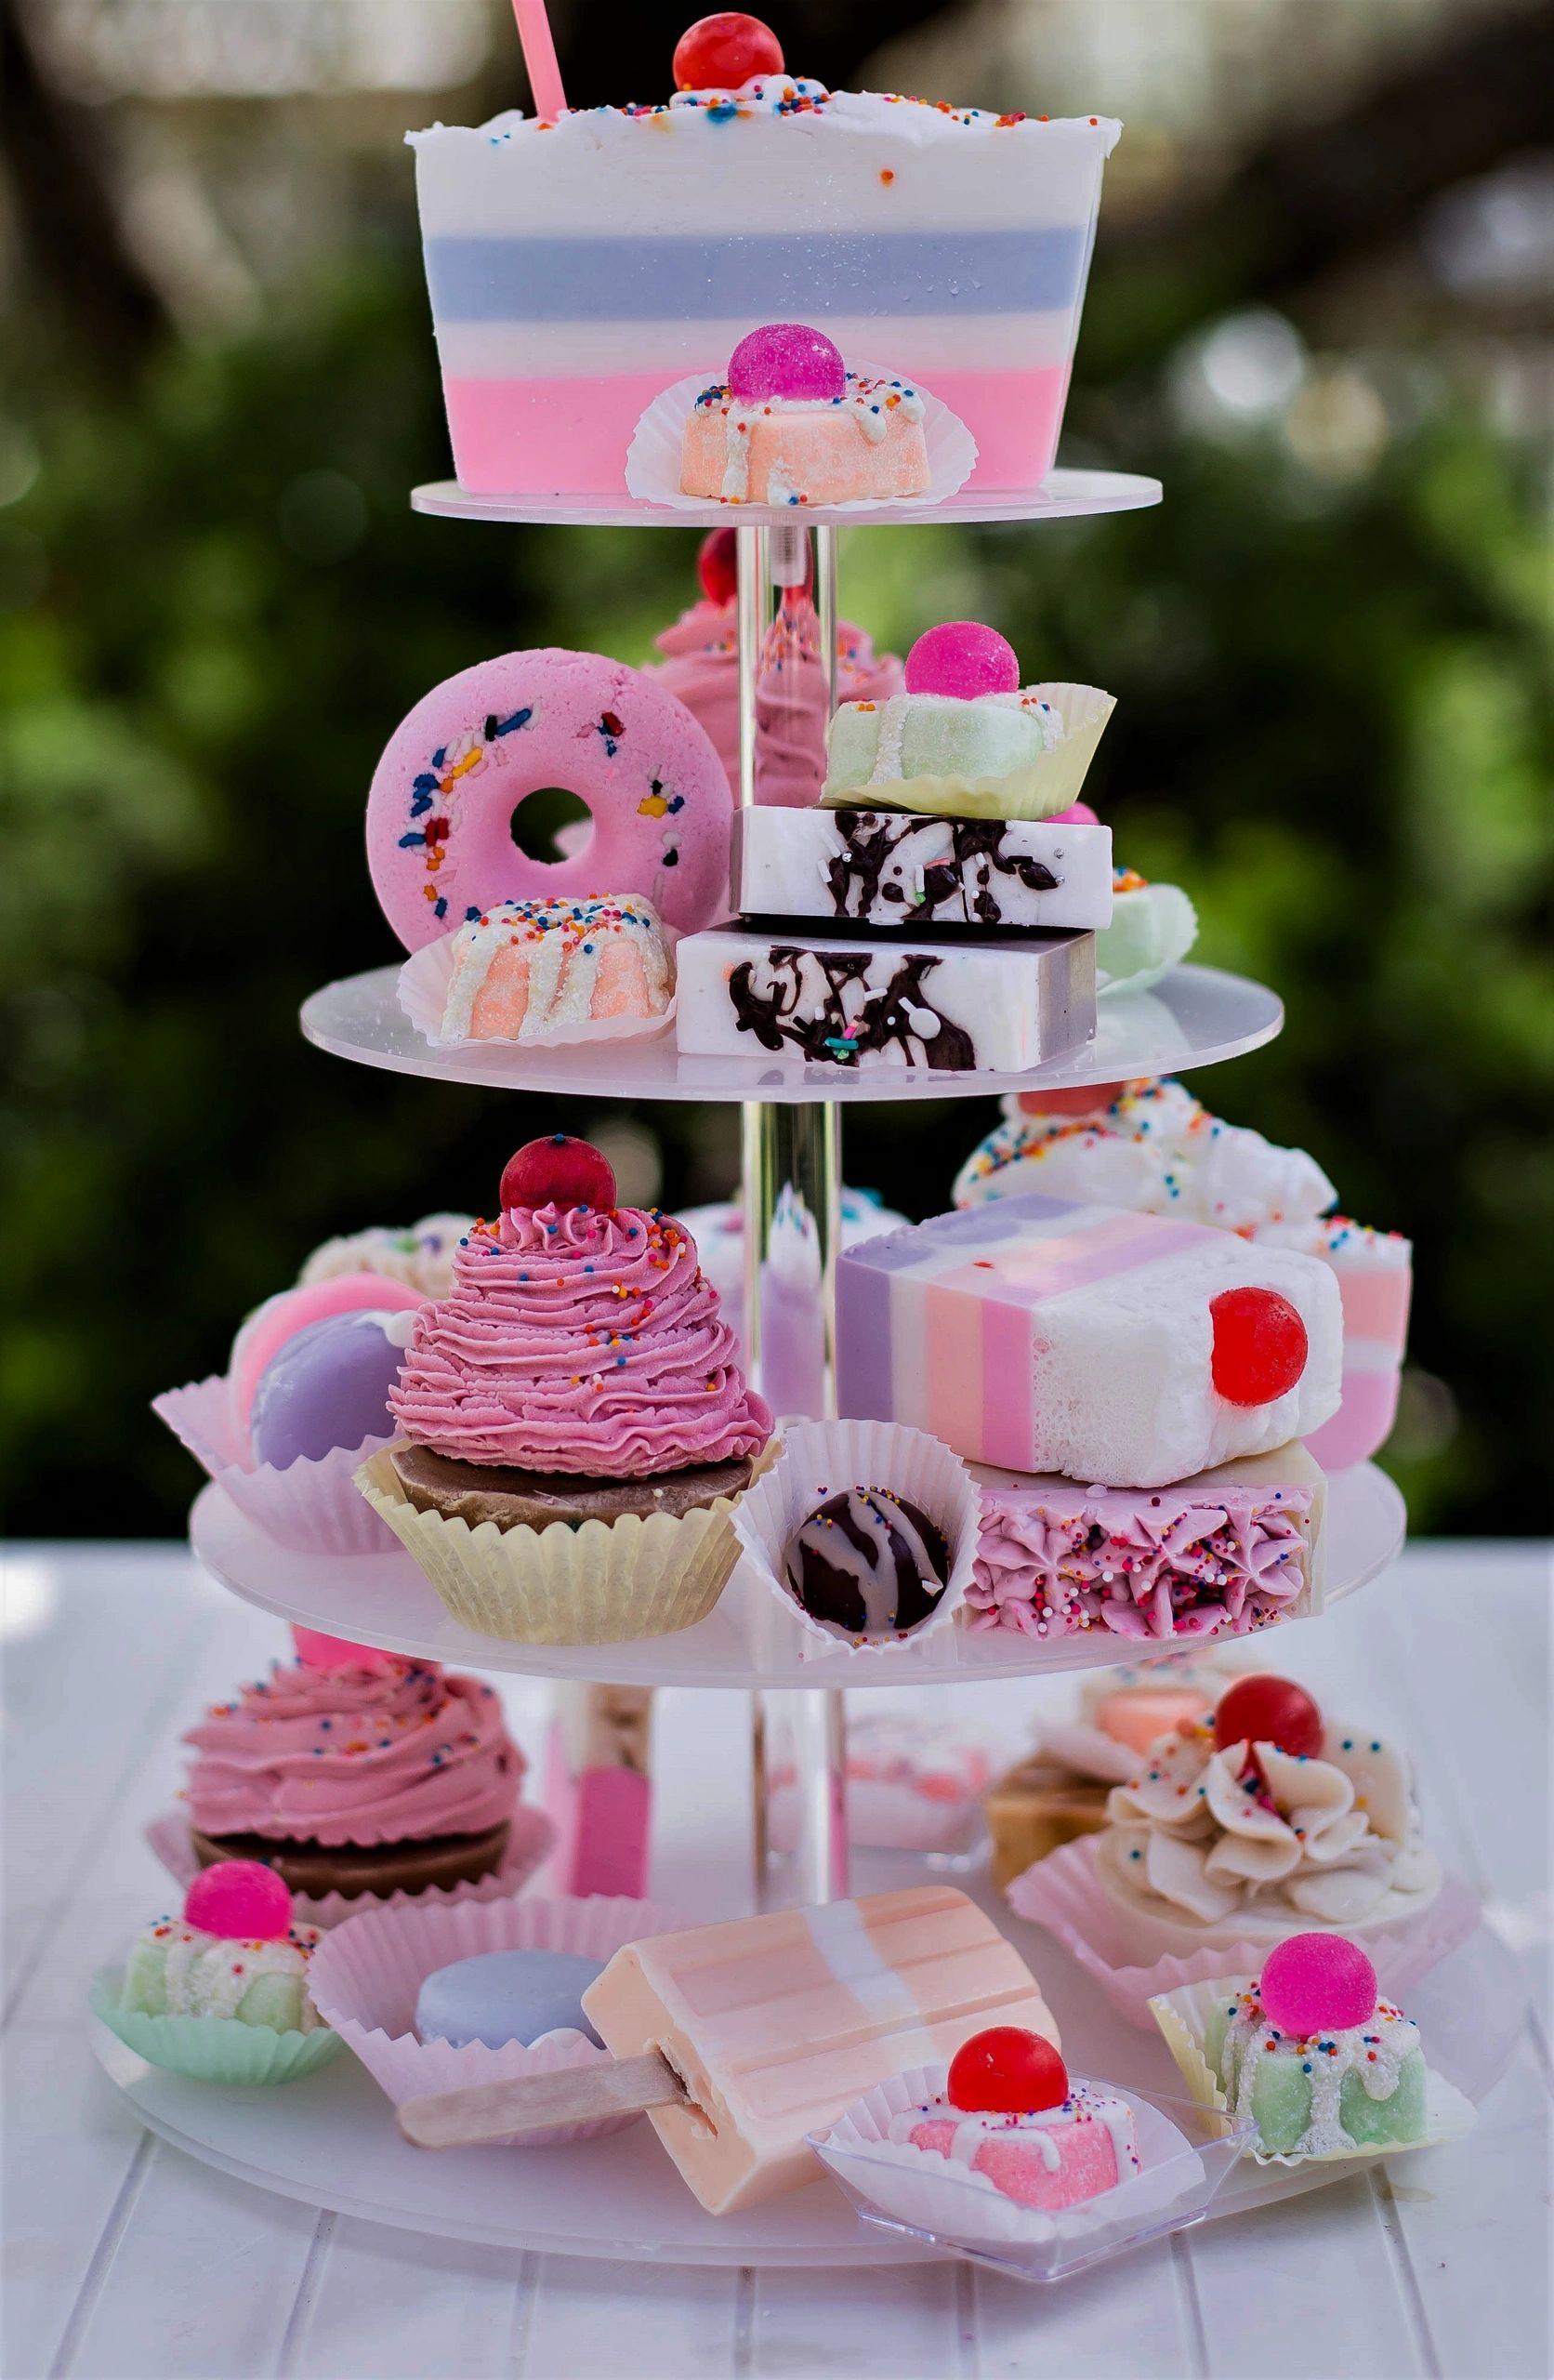 Surprising Birthday Cake Soap Dessert Soap Classic Suds Personalised Birthday Cards Sponlily Jamesorg